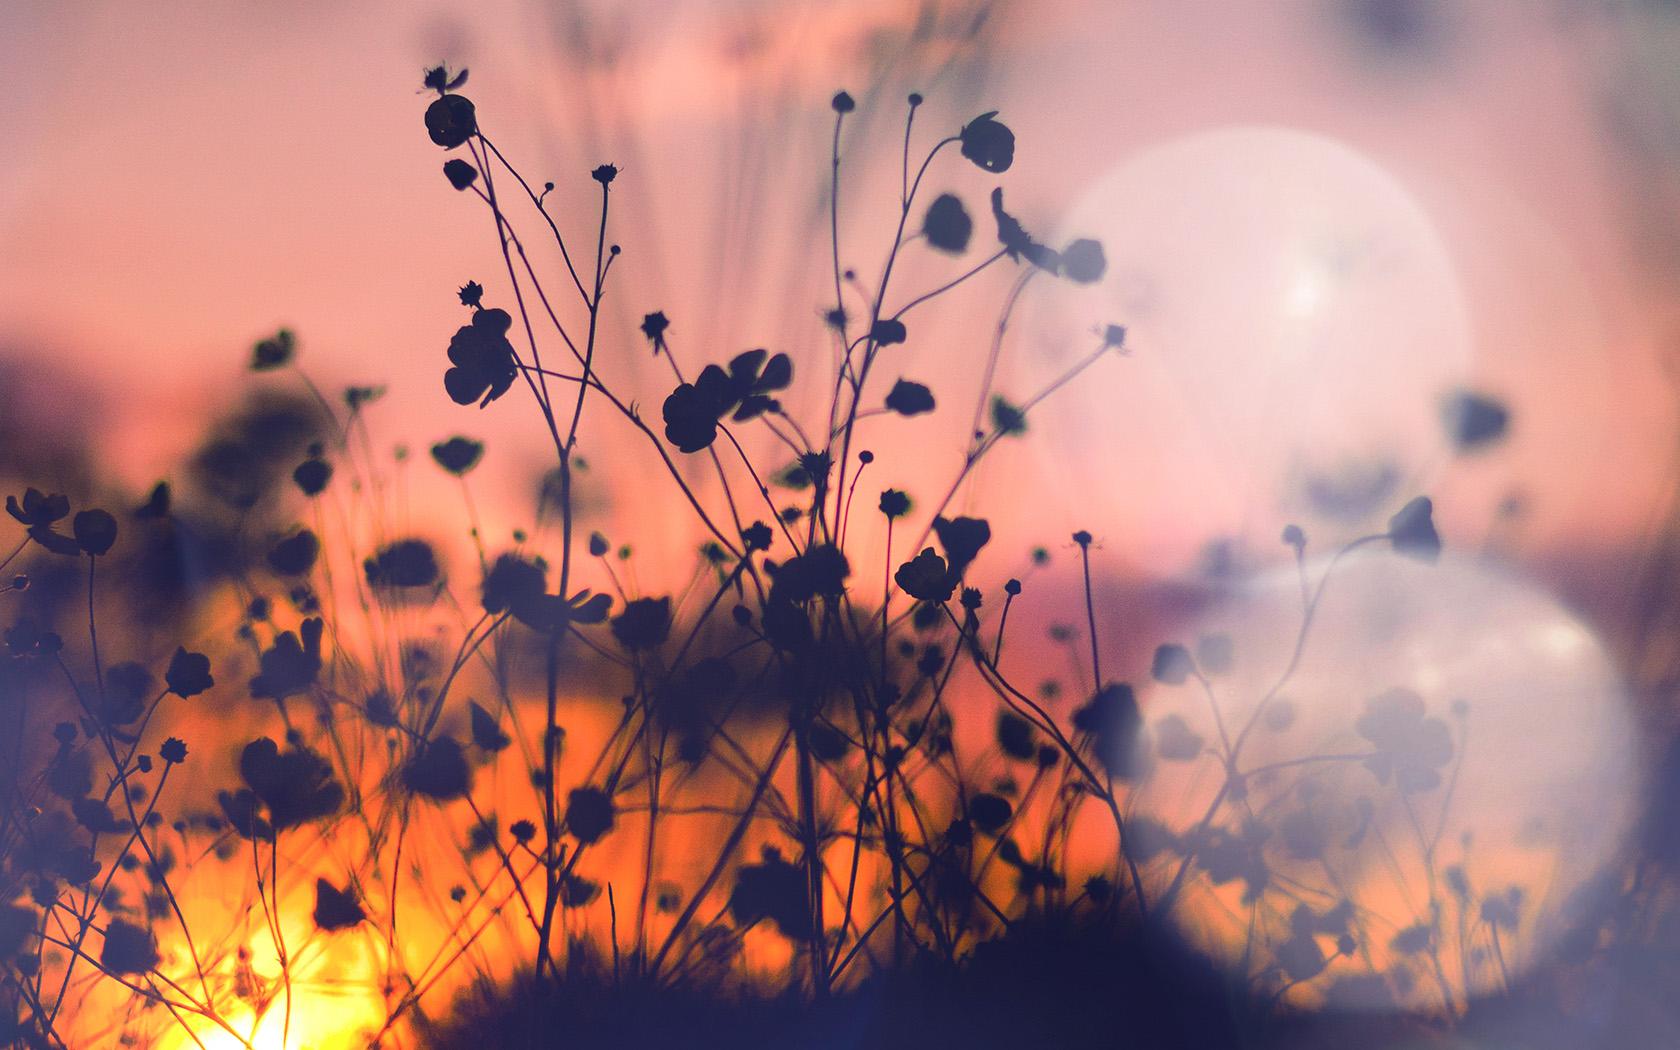 Cute Floral Wallpaper Wide Wallpaper For Desktop Laptop Mv66 Night Nature Flower